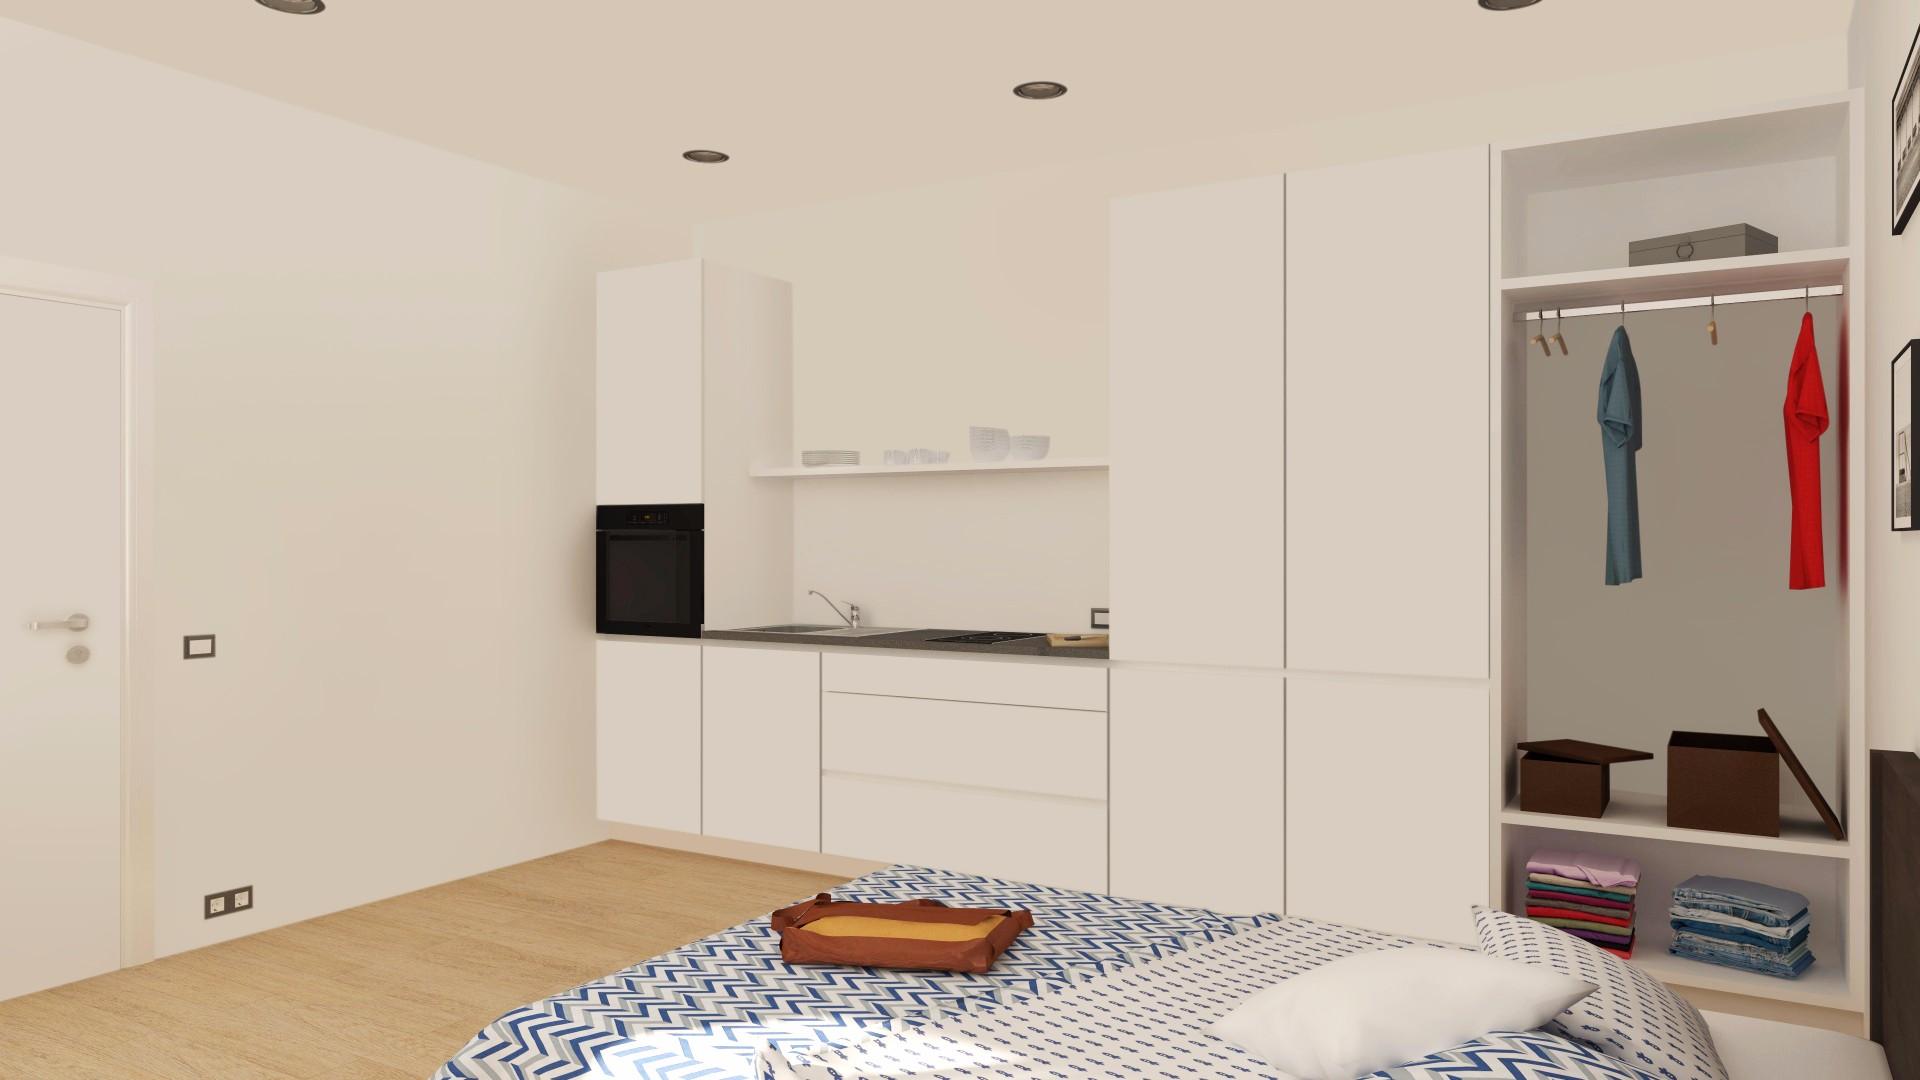 Residentie Lambertus_interieur_2.jpg